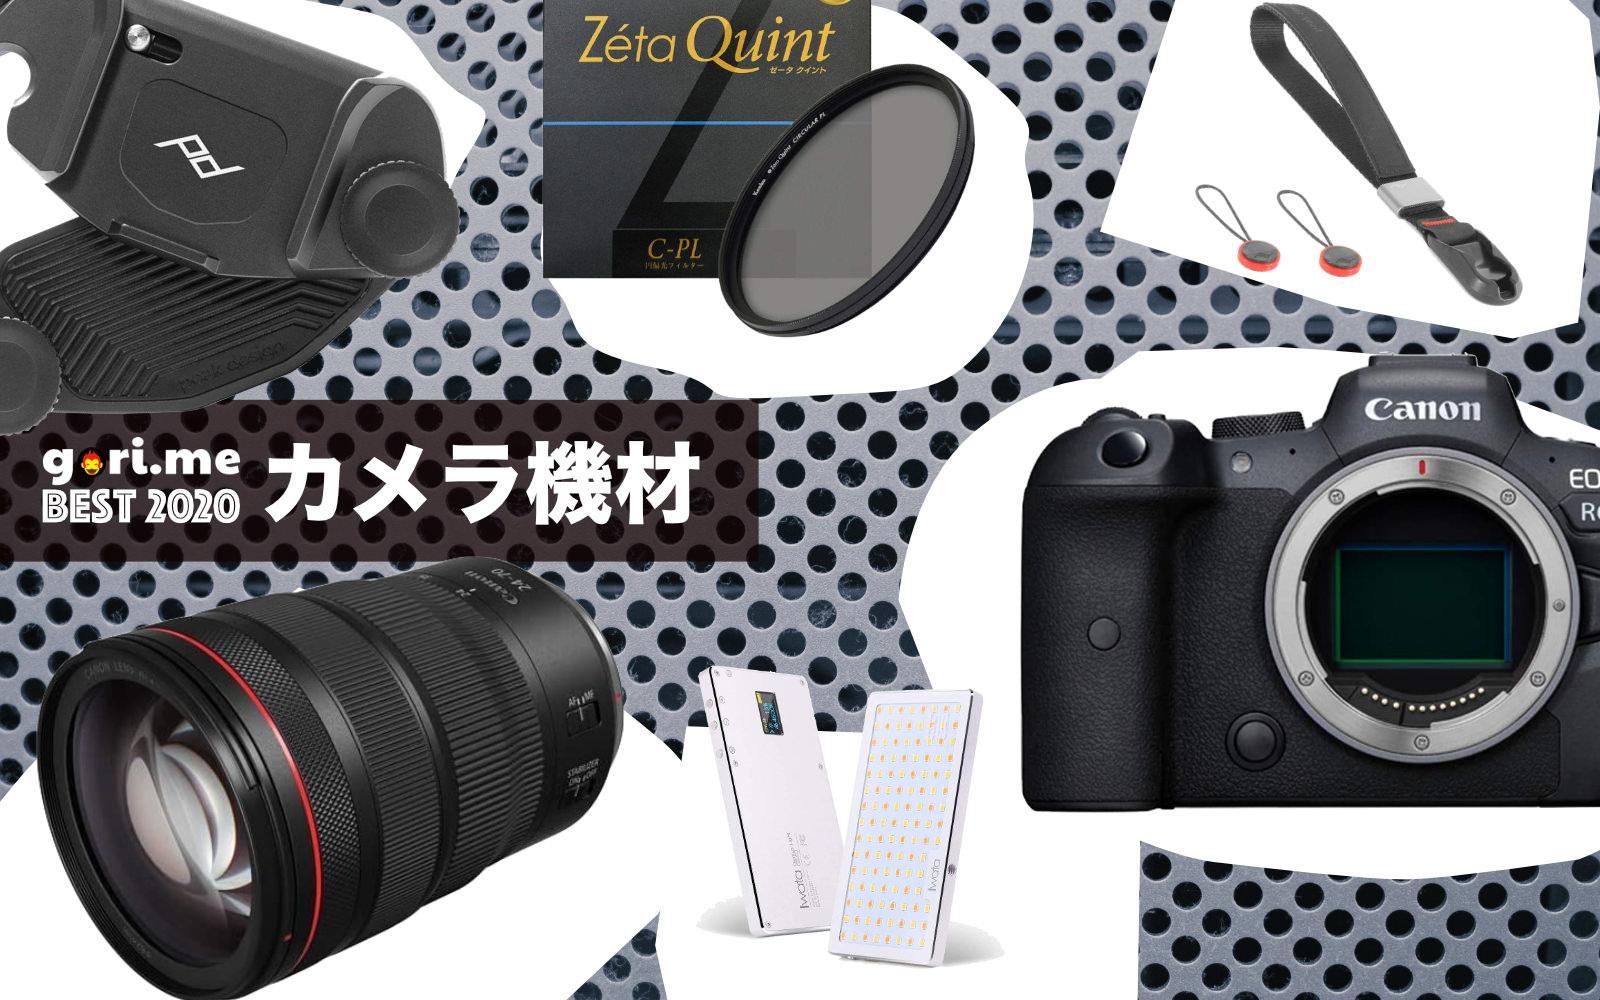 Gorime best 2020 camera gadgets